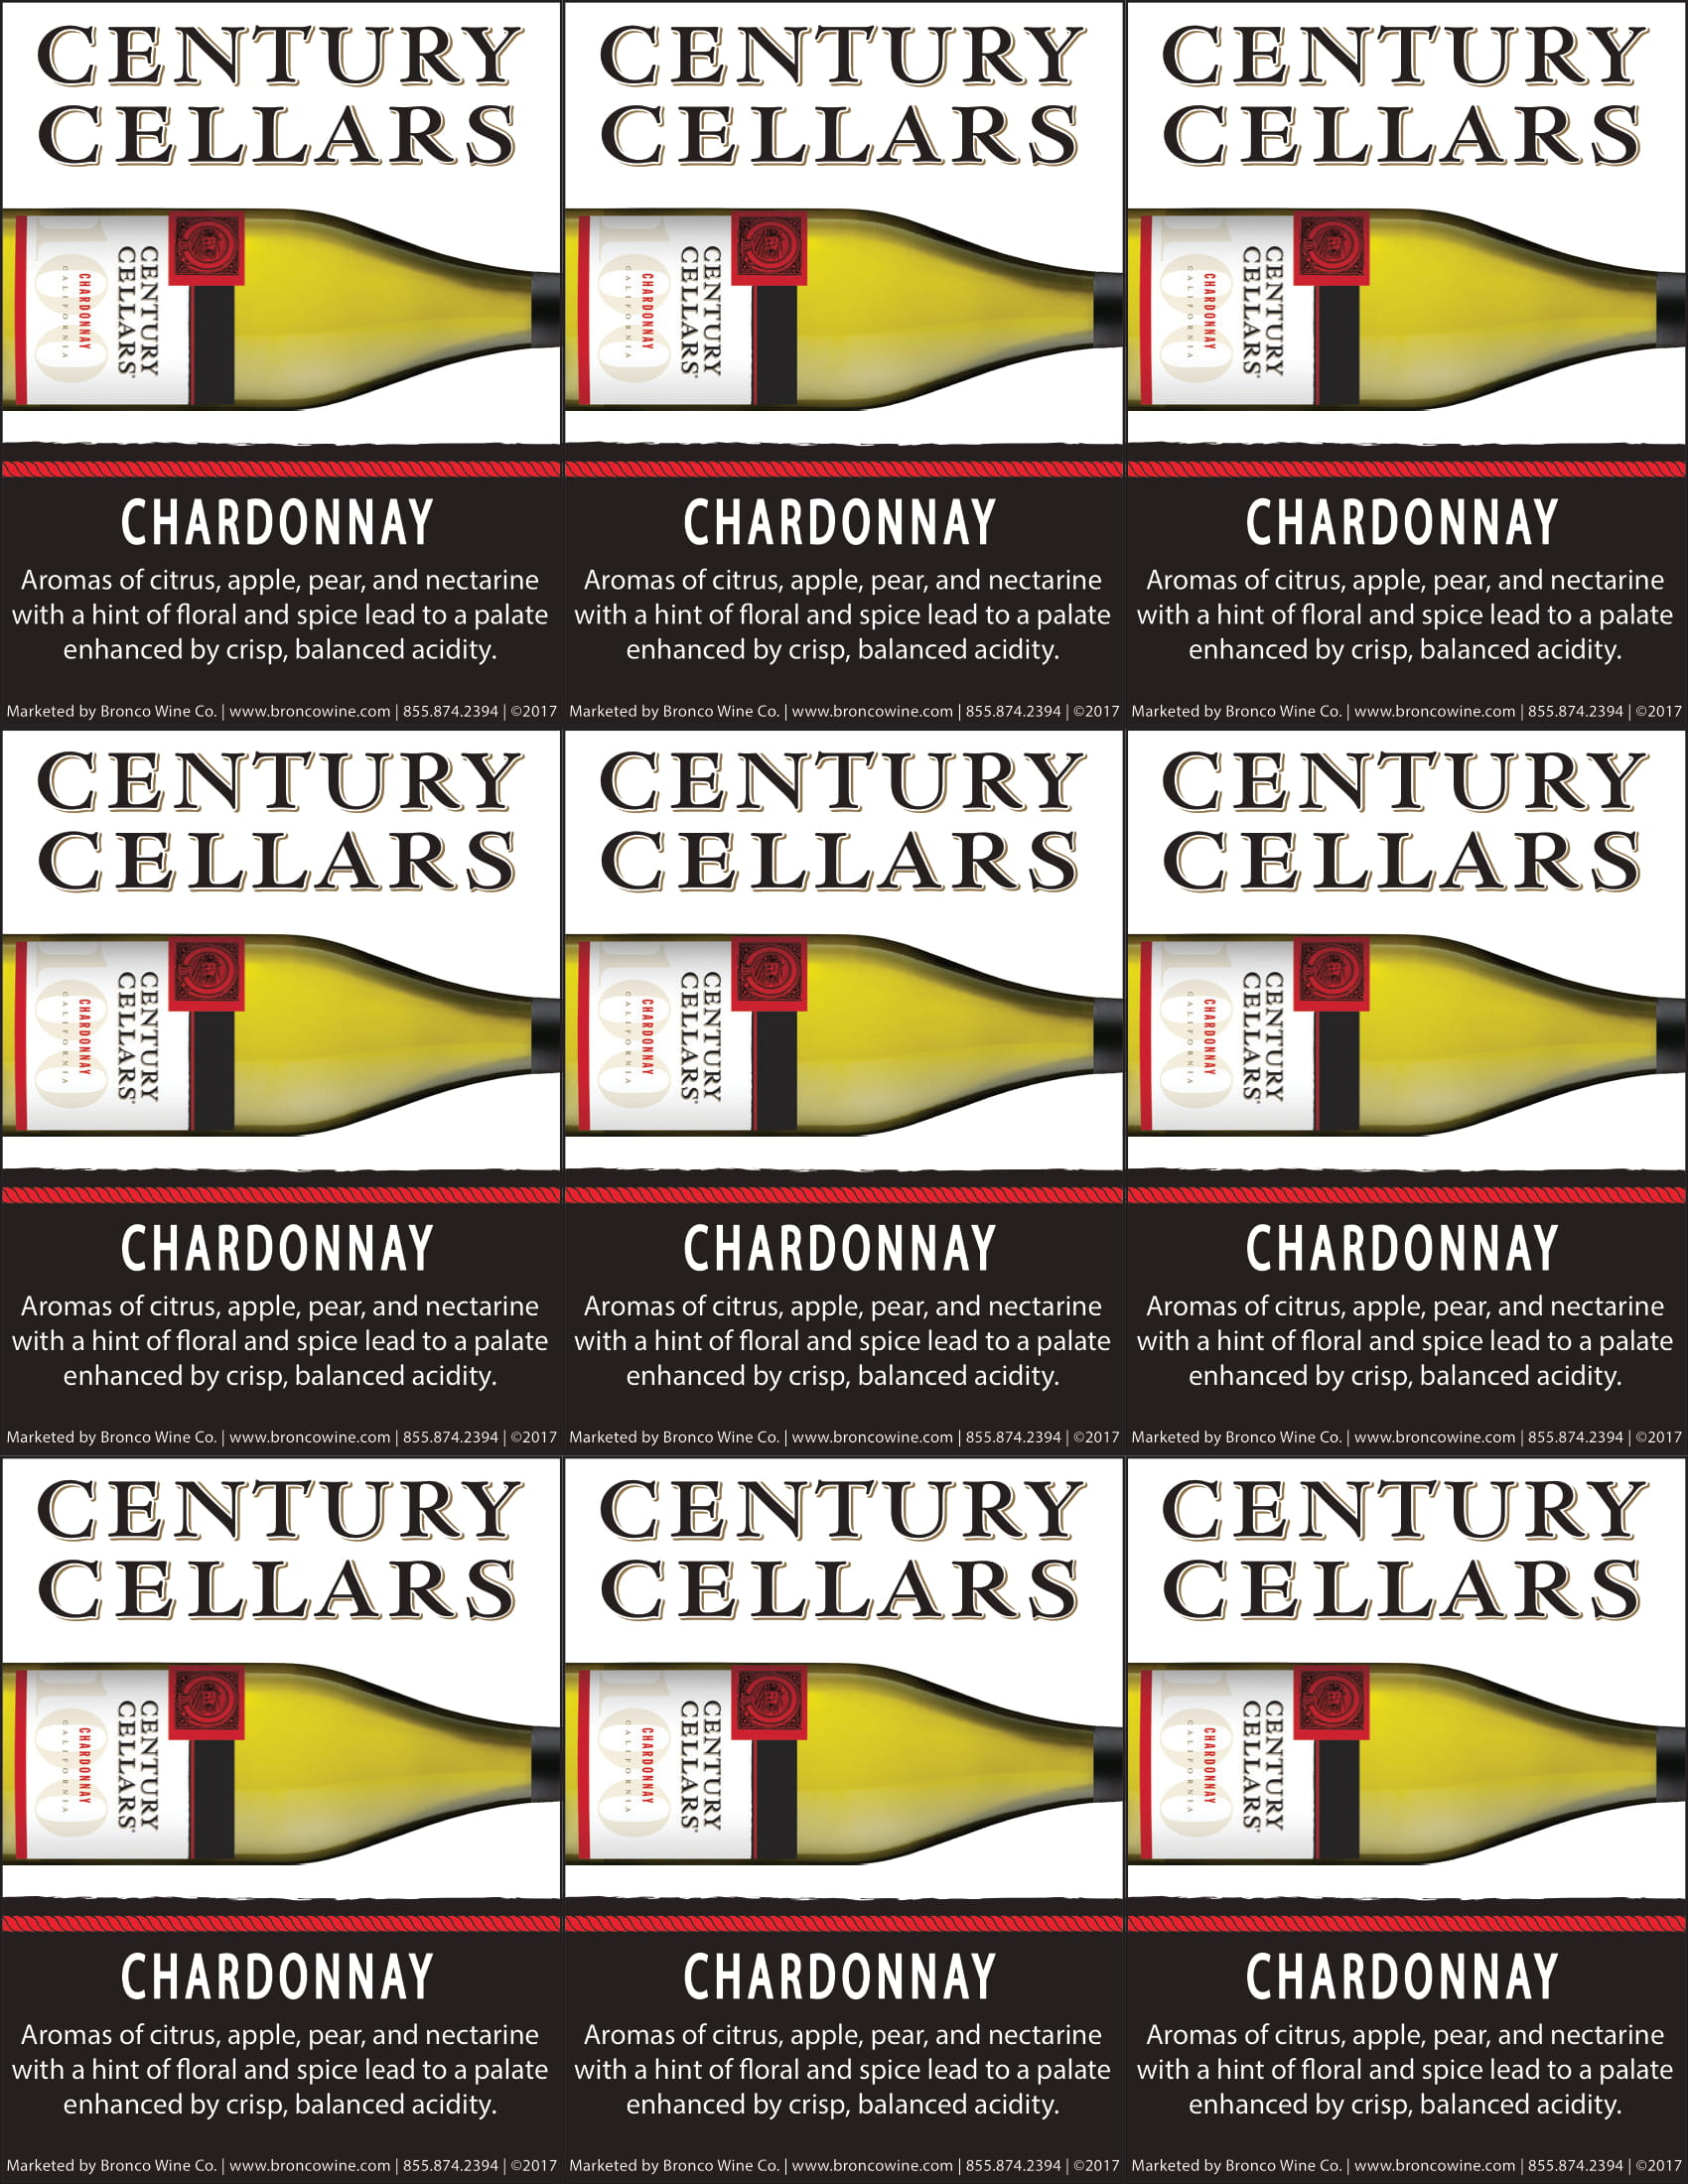 Century Cellars Chardonnay Shelf Talkers